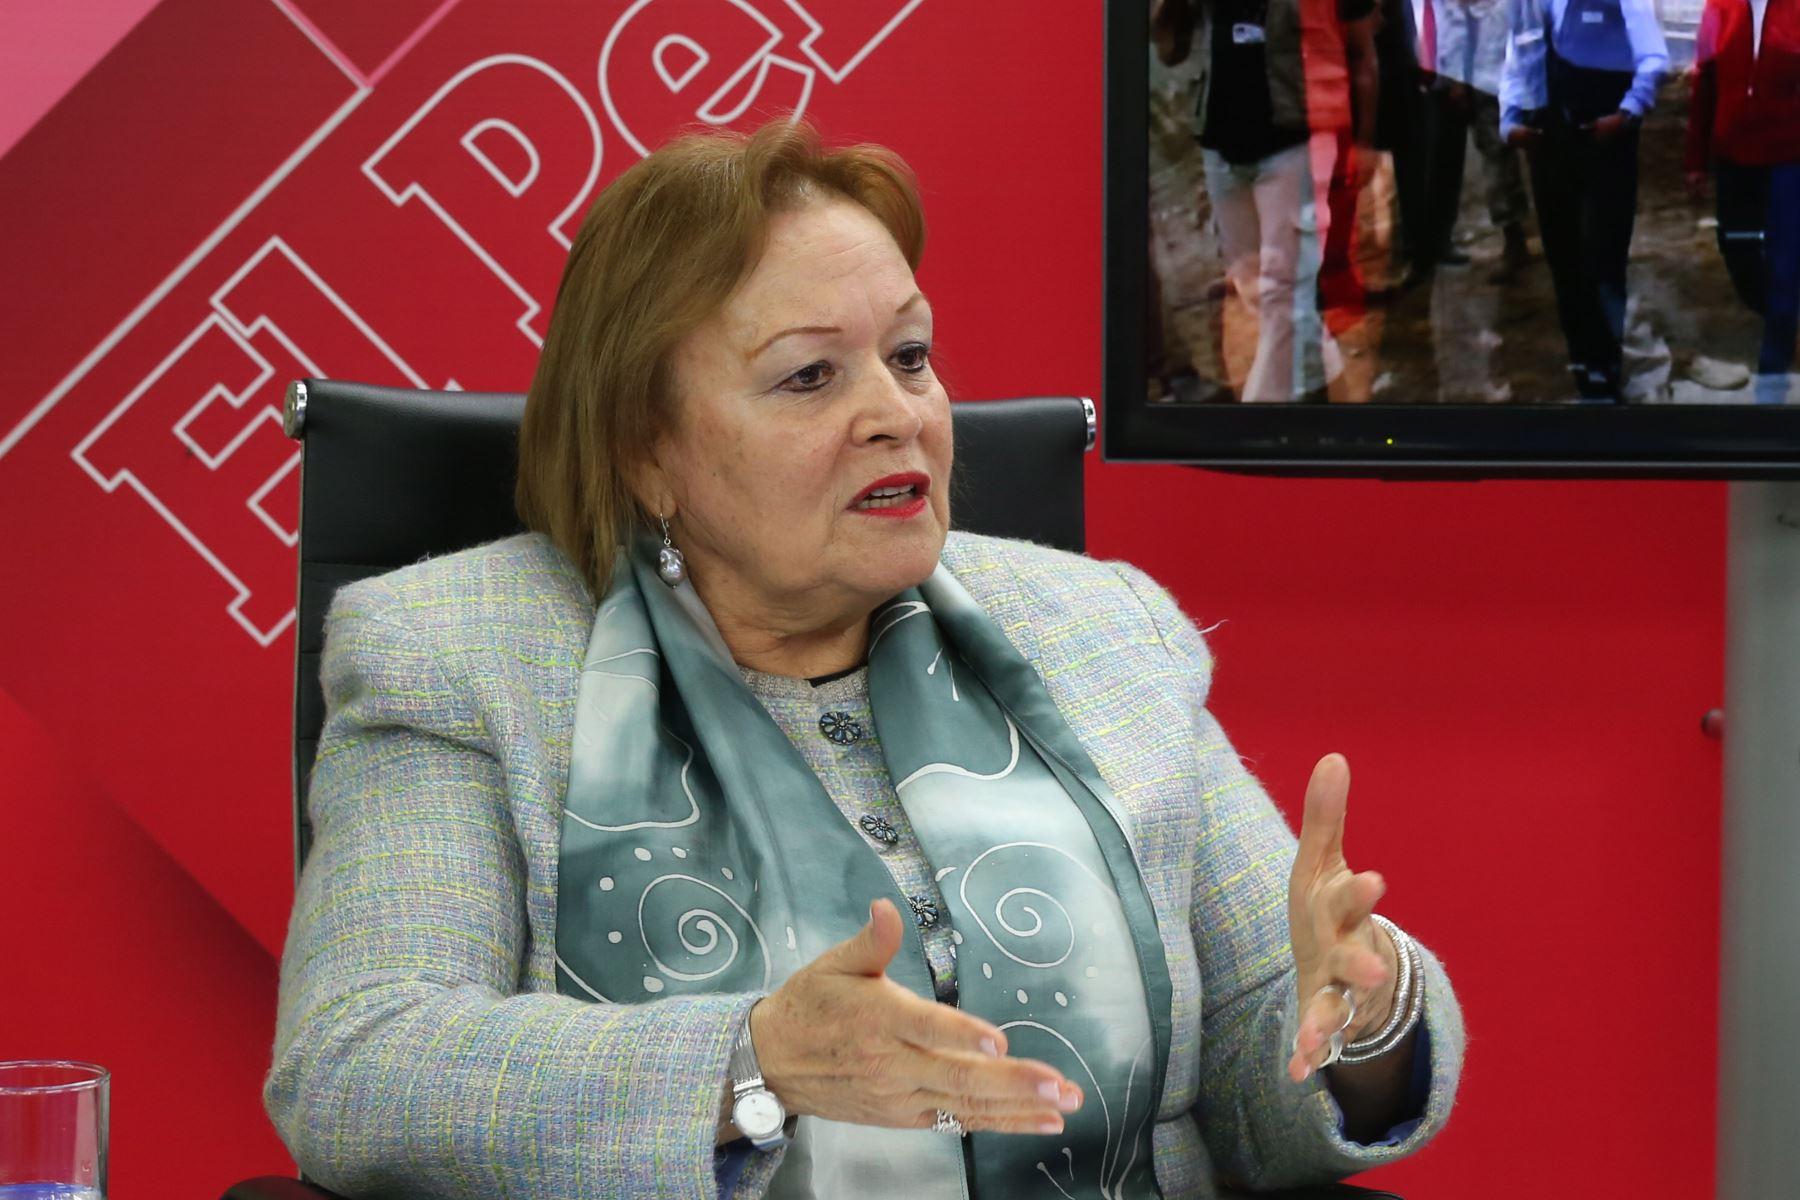 Presidenta de la Cámara de Comercio de Lima, Yolanda Torriani. ANDINA/Dante Zegarra